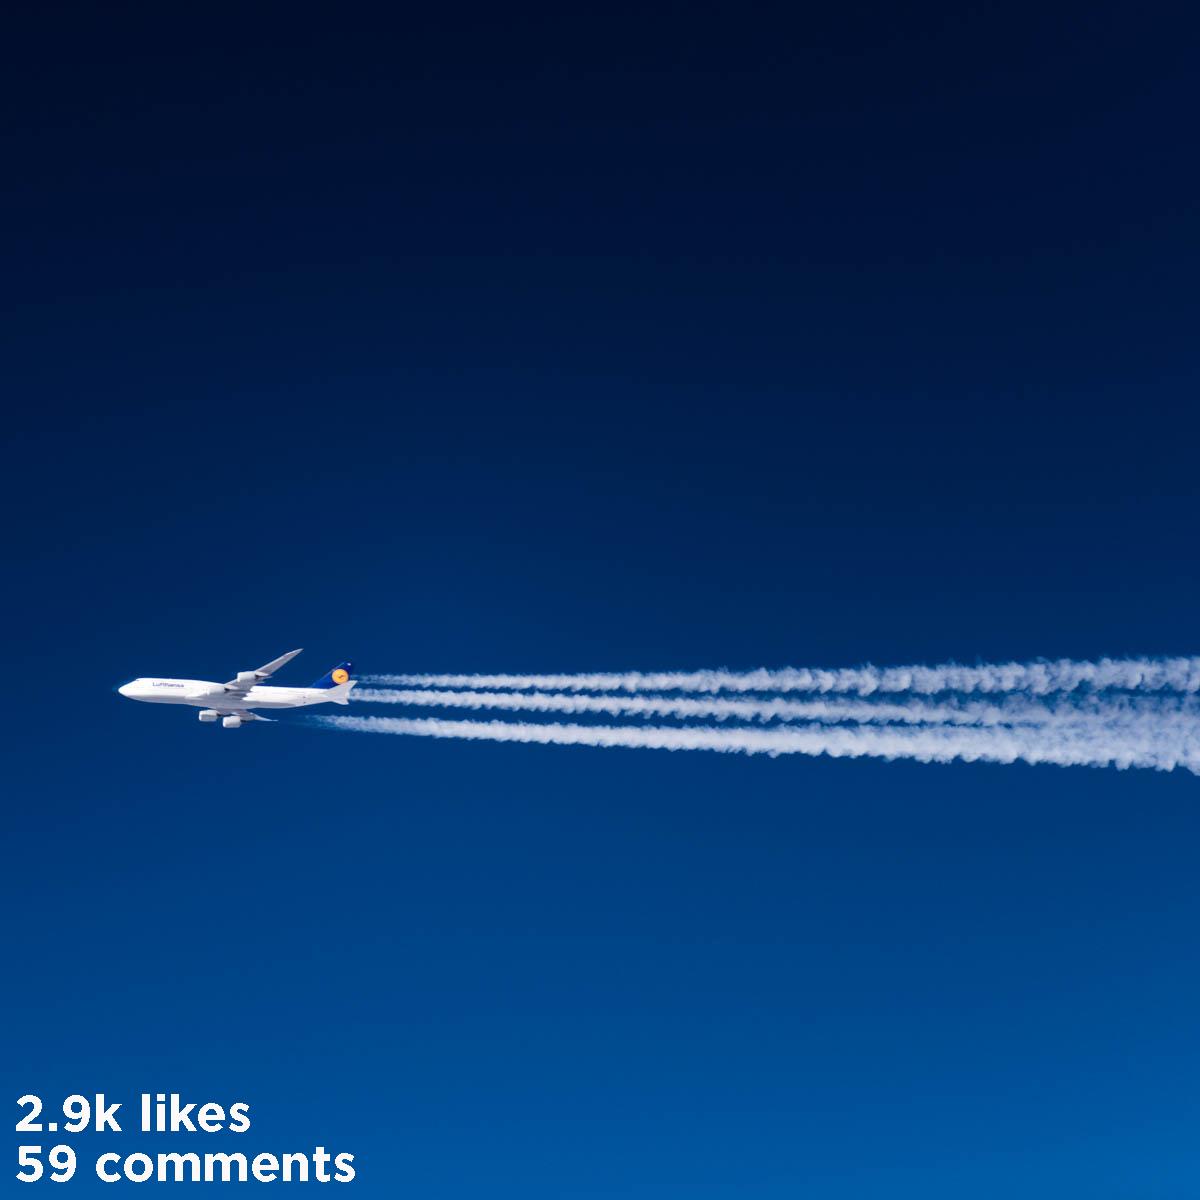 Media Kit LH 747-8 fly by (1 of 1) copy.jpg